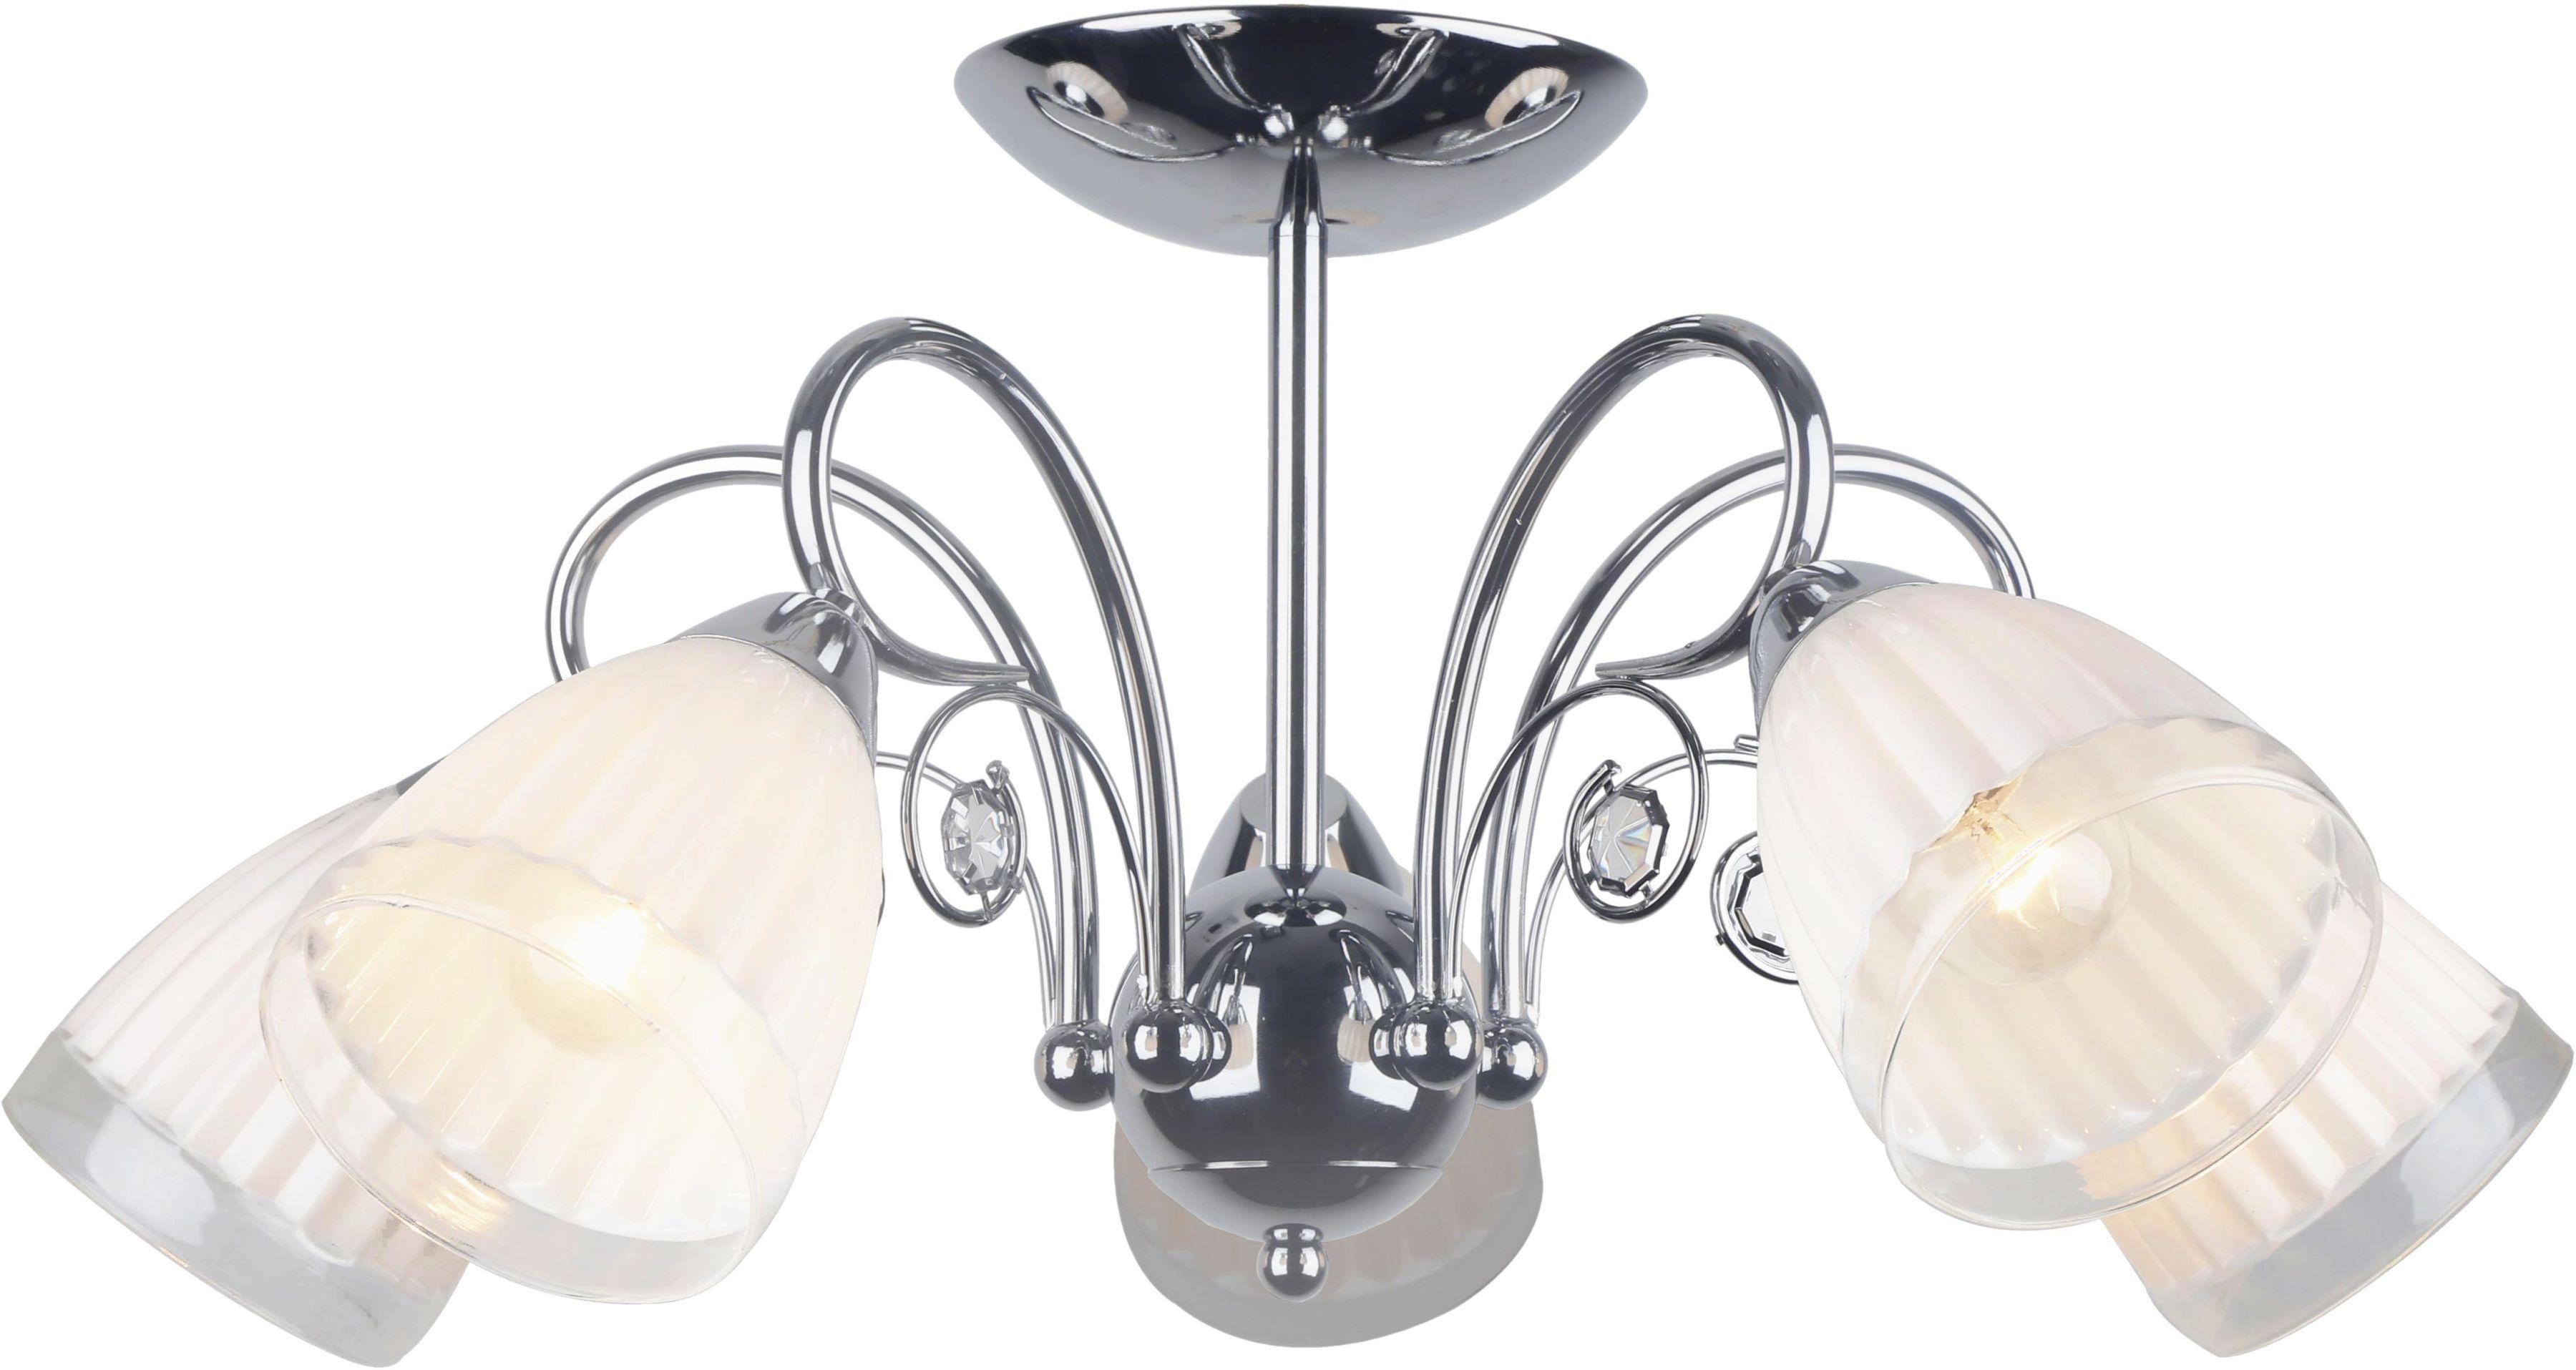 Lampex Nola 5 448/5 plafon lampa sufitowa falisto mleczno-biały klosz 5x40W E14 58cm